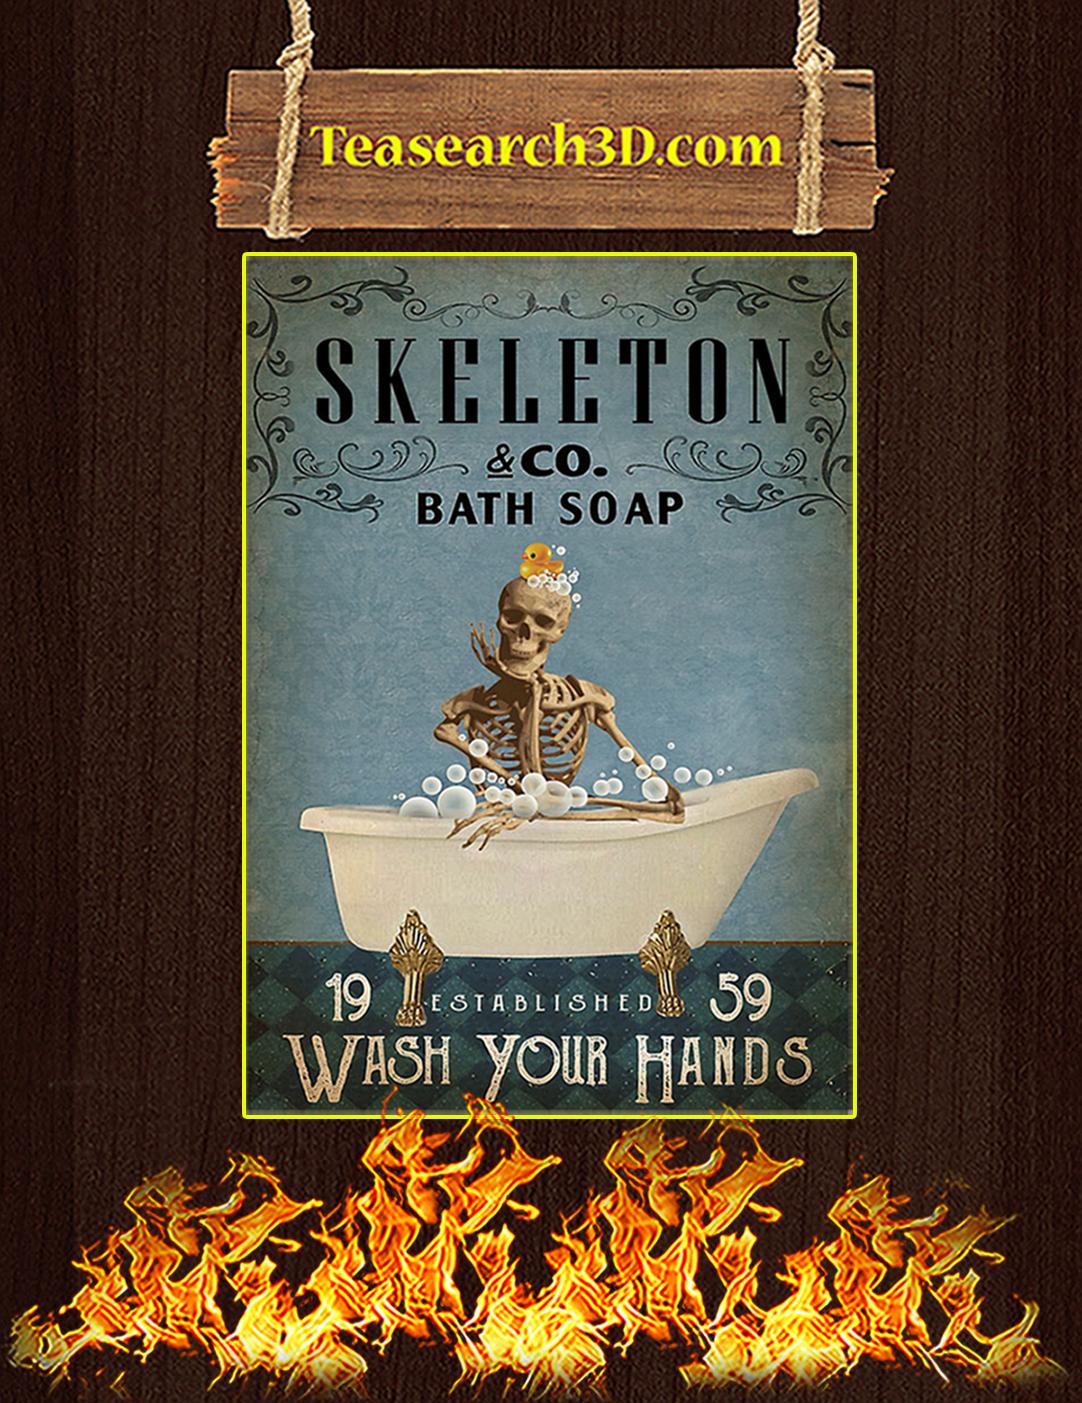 Skeleton Co Bath Soap Wash Your Hands Poster A2